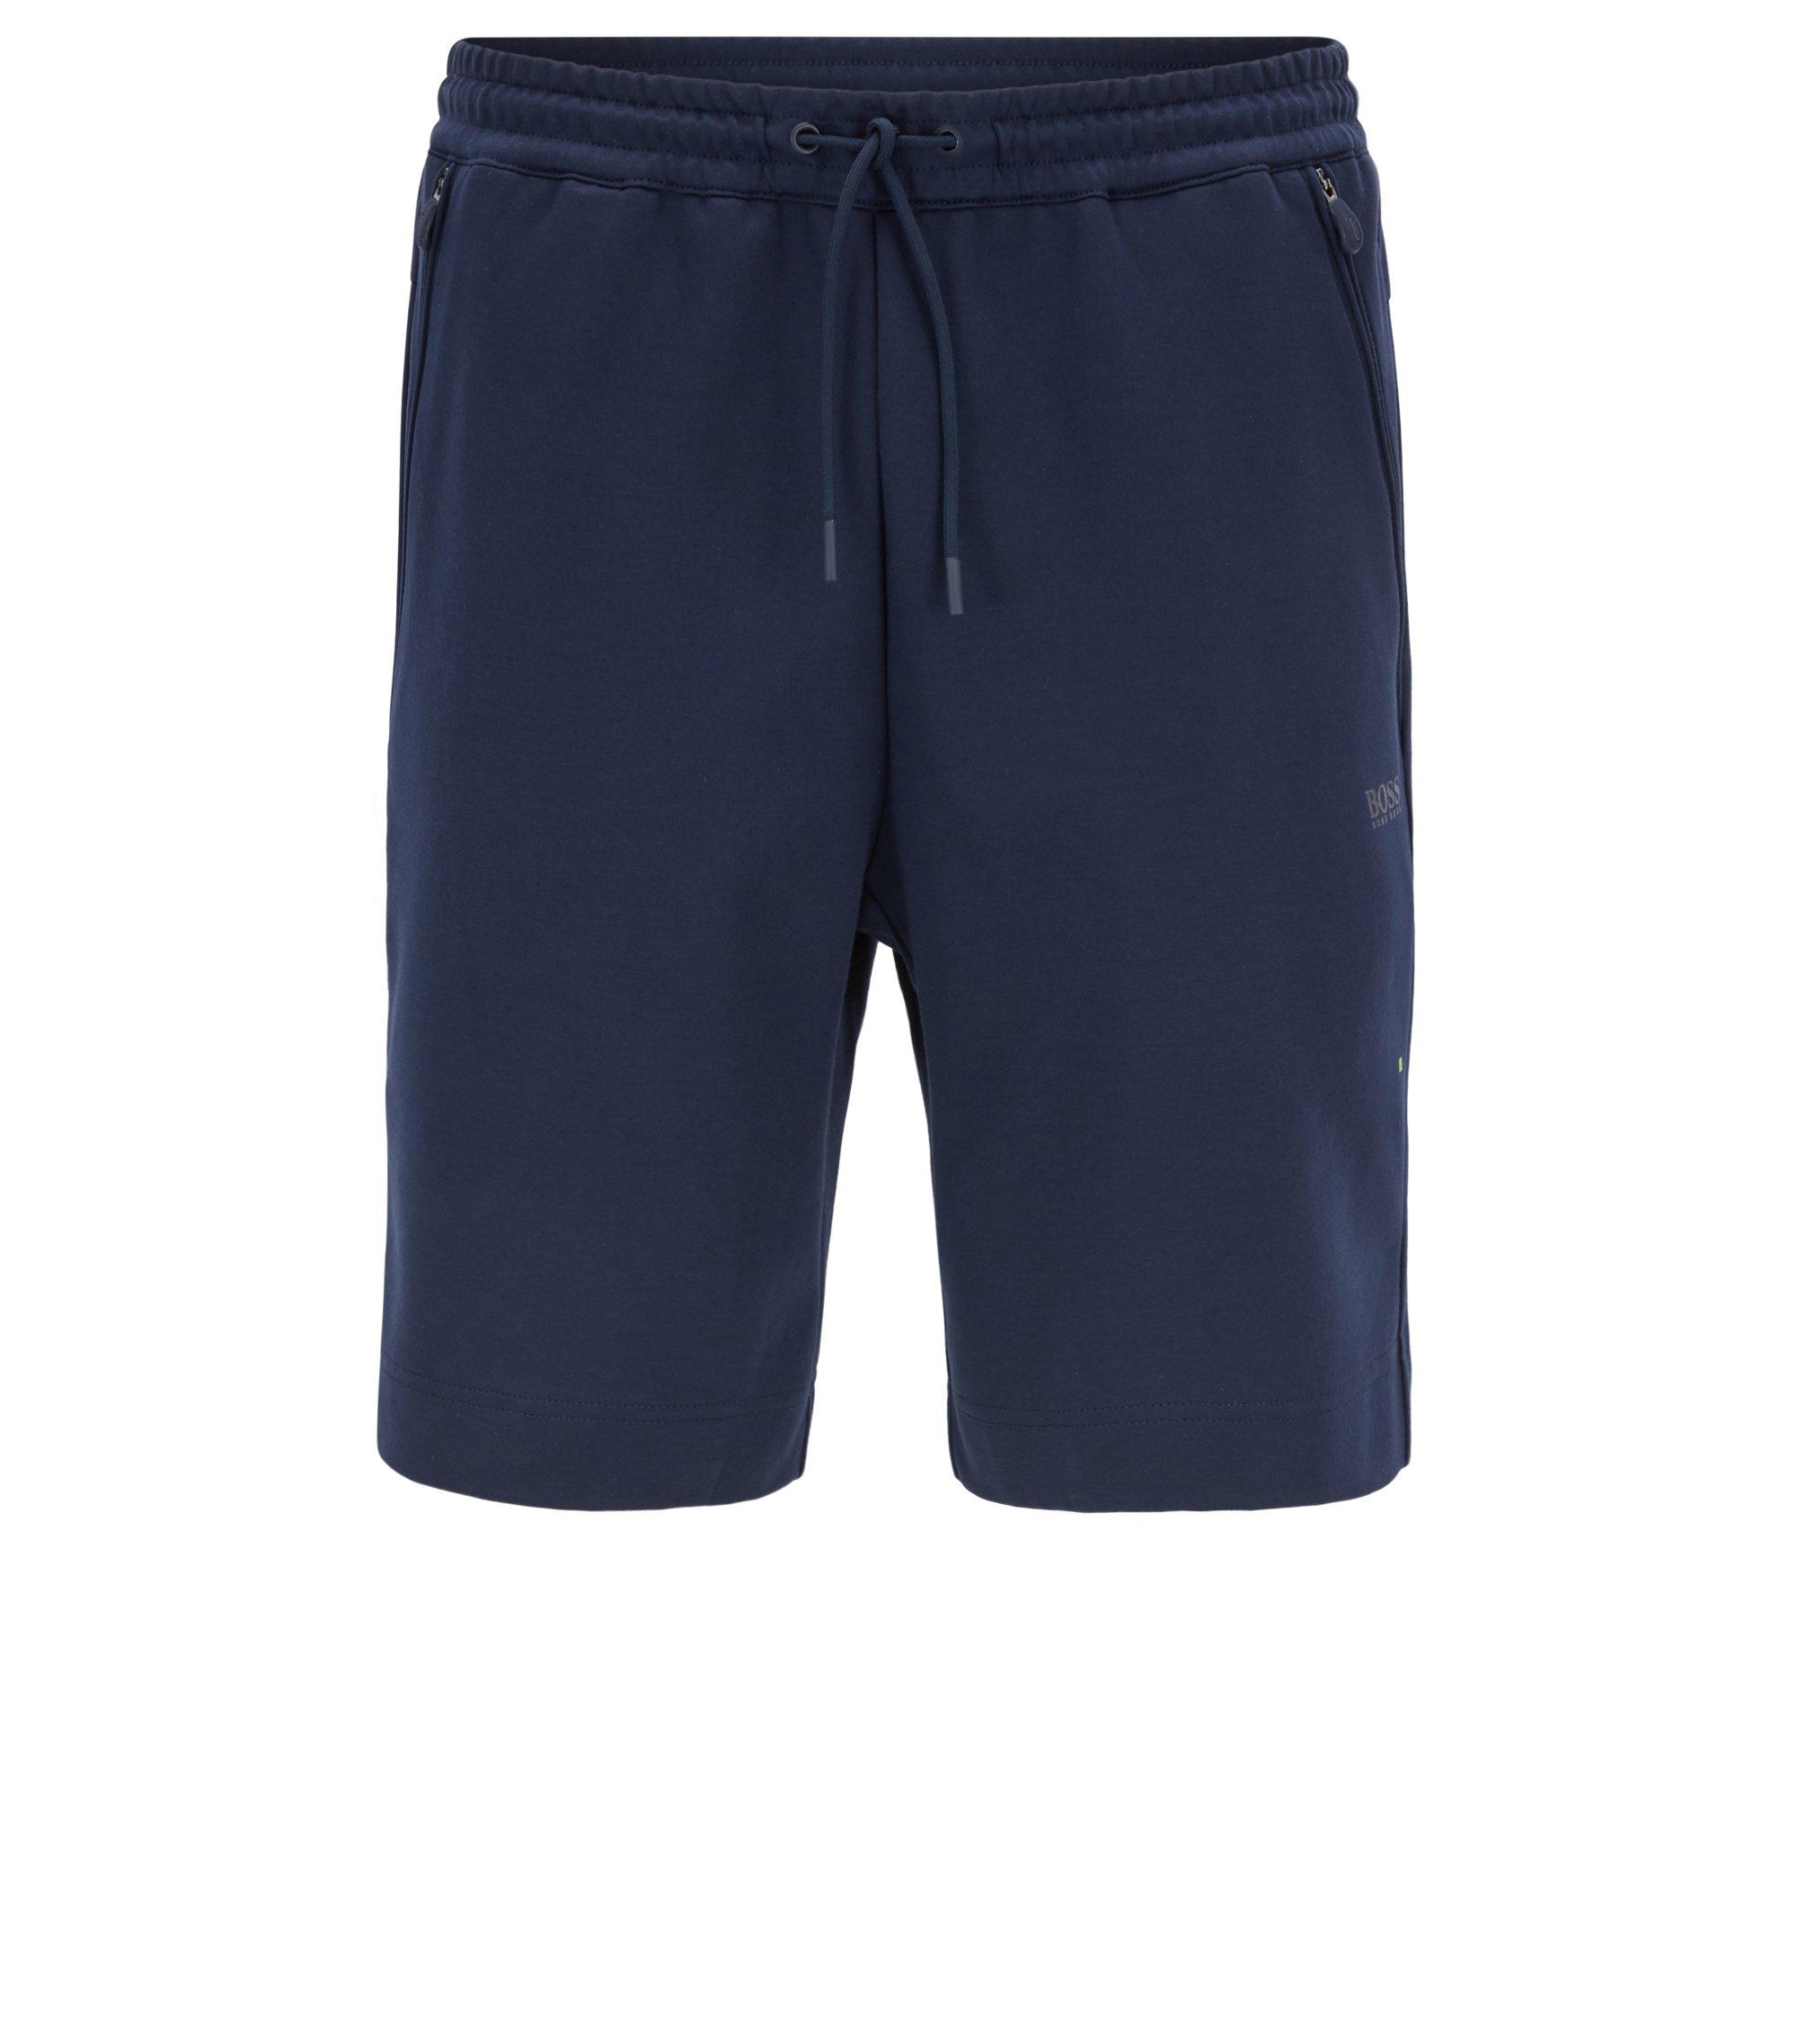 Wetterfeste Slim-Fit Shorts aus Baumwoll-Mix, Dunkelblau